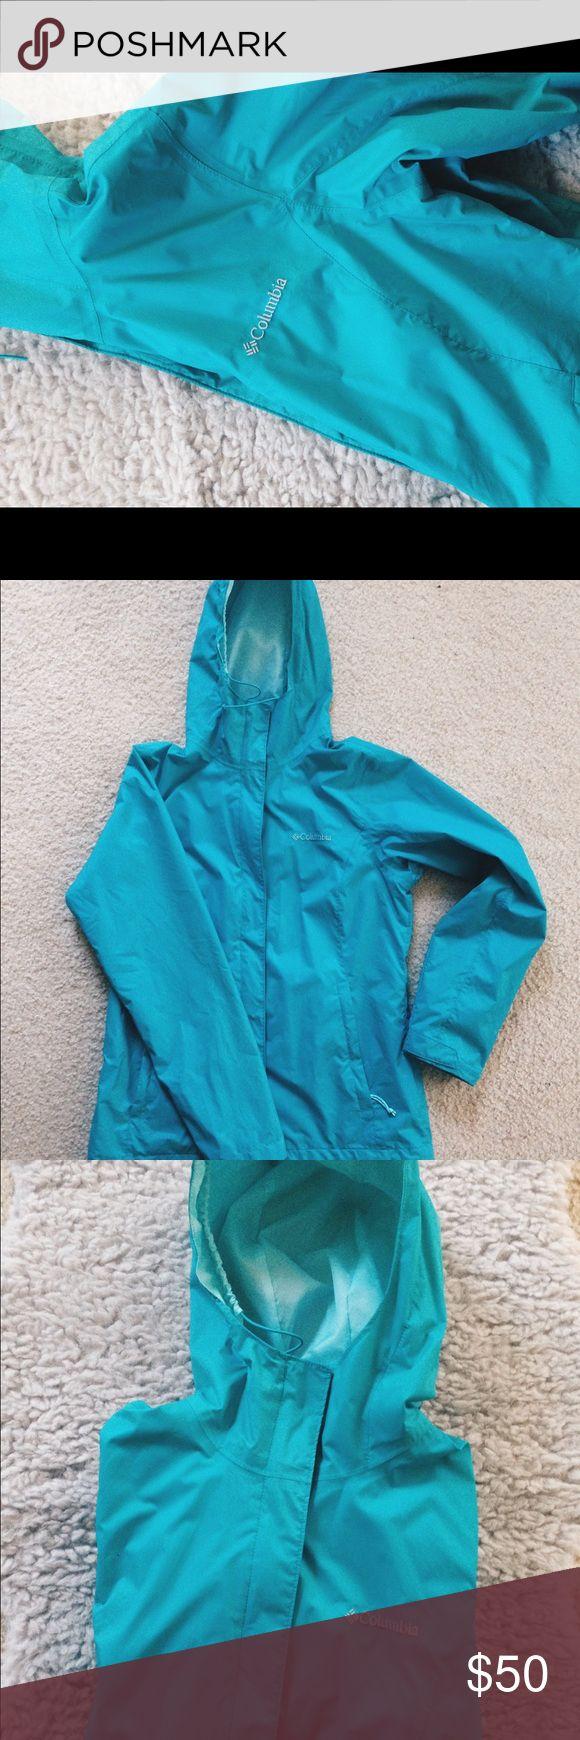 "Women's Columbia ArcadiaII Lightweight Rain Jacket Bright teal blue, light-weight Columbia Arcadia II rain jacket! Worn twice and in ""like new"" condition. Freshly laundered. Size small. Columbia Jackets & Coats"